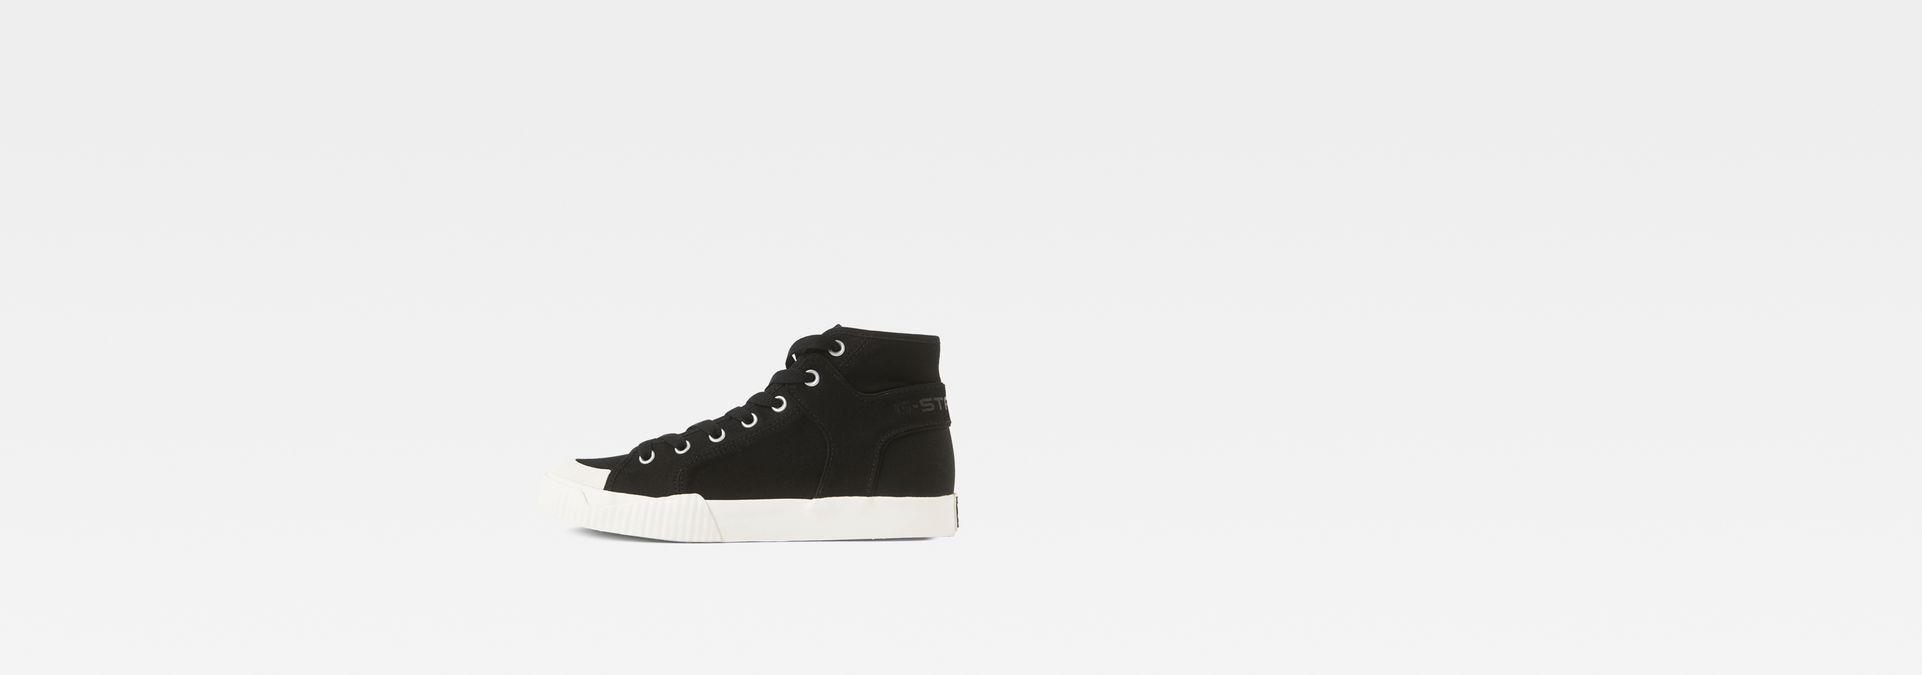 2eb2a4a0e3c G-Star RAW® Rackam Tendric Mid Sneakers Black side view ...